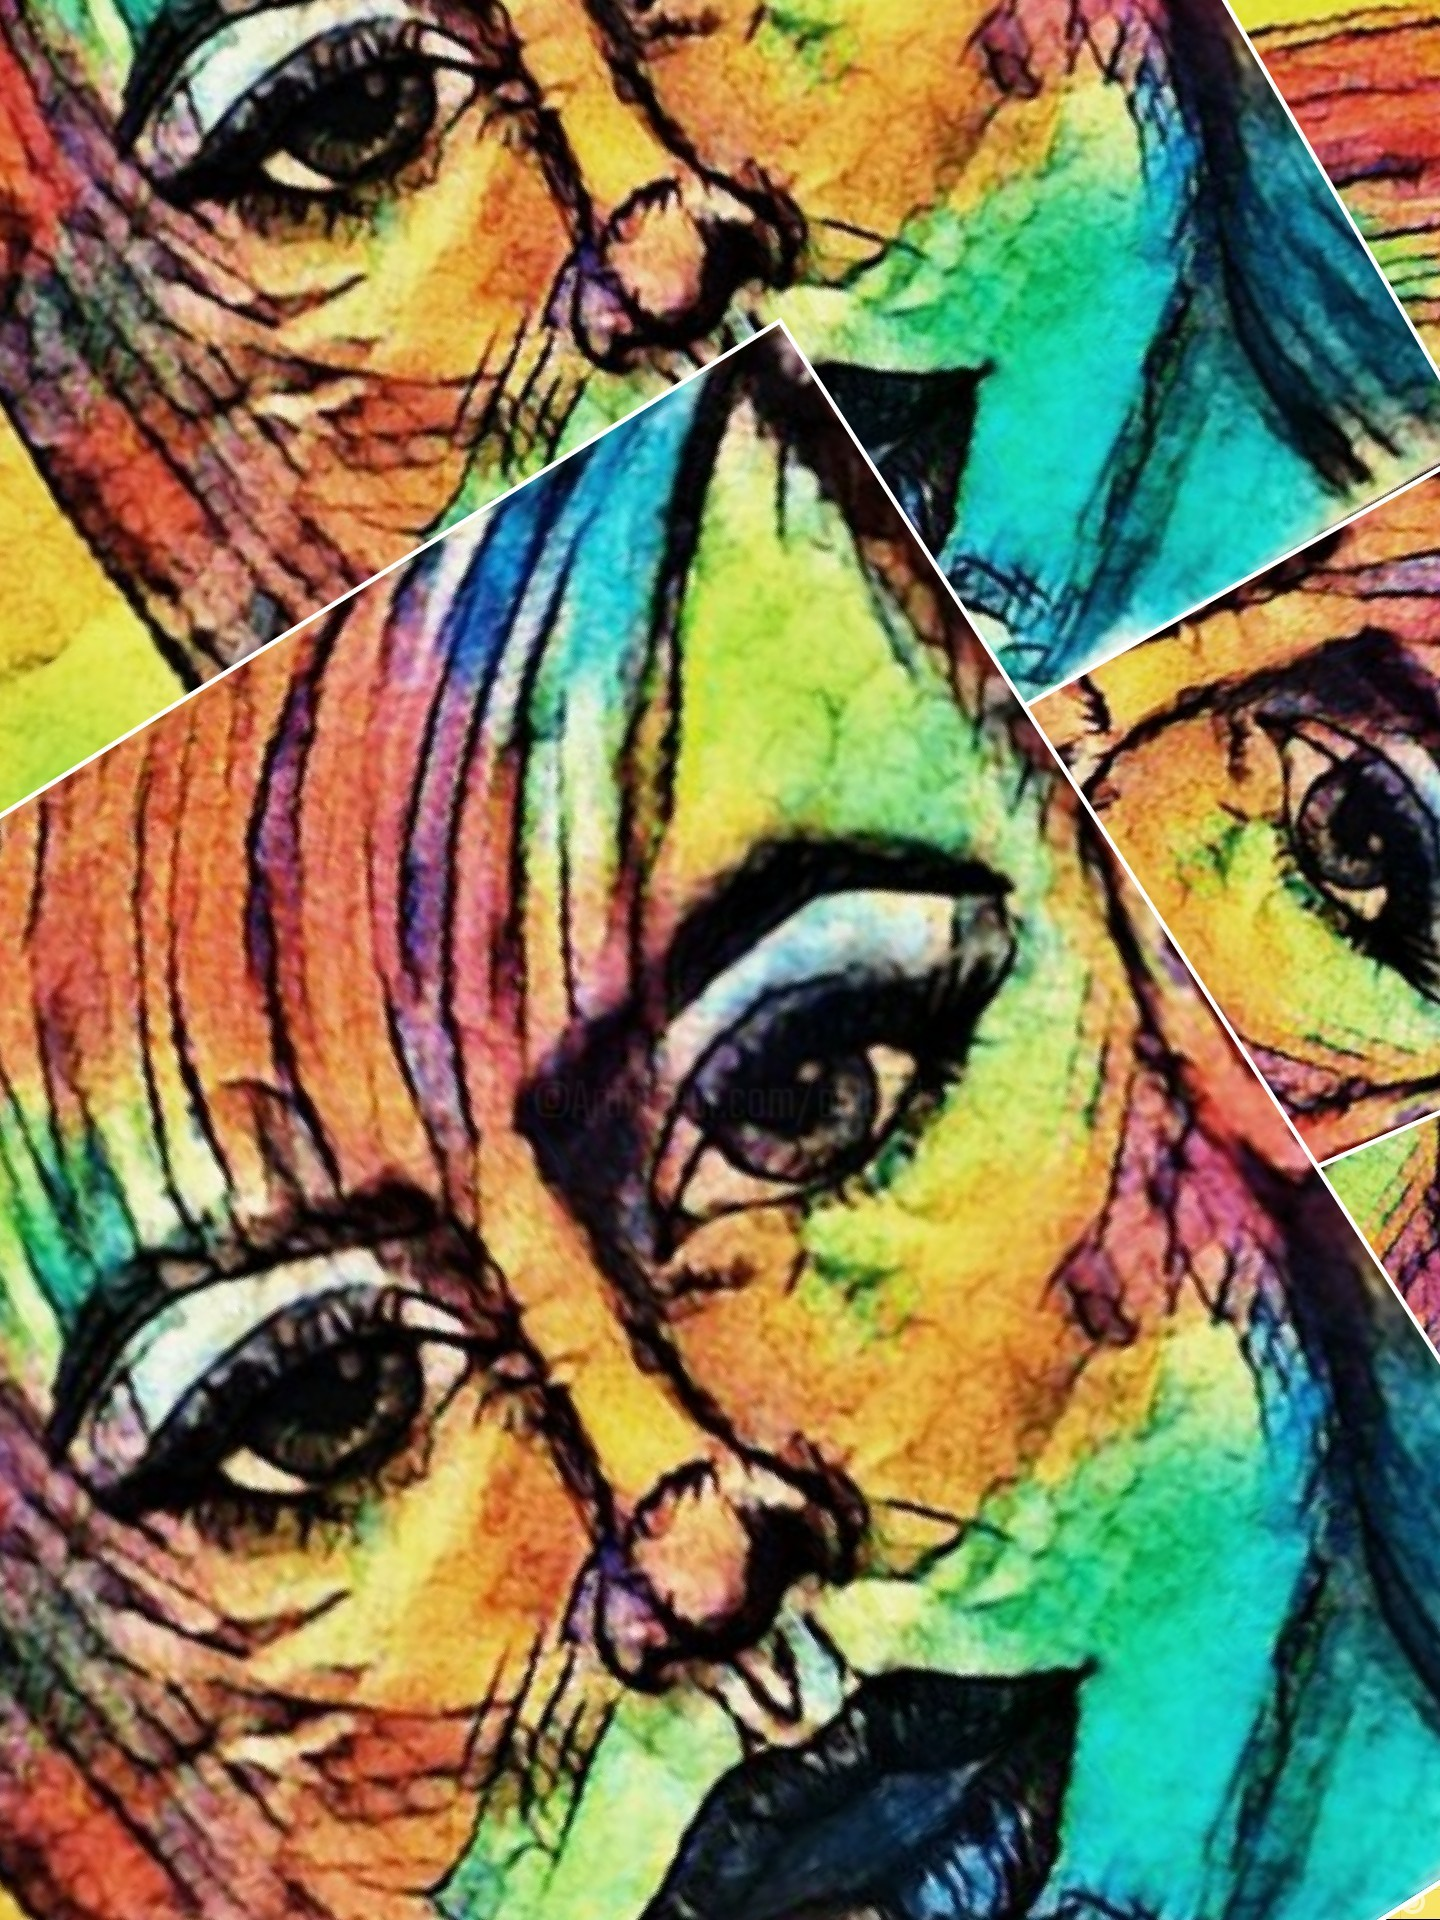 Agl - Femme multicolore